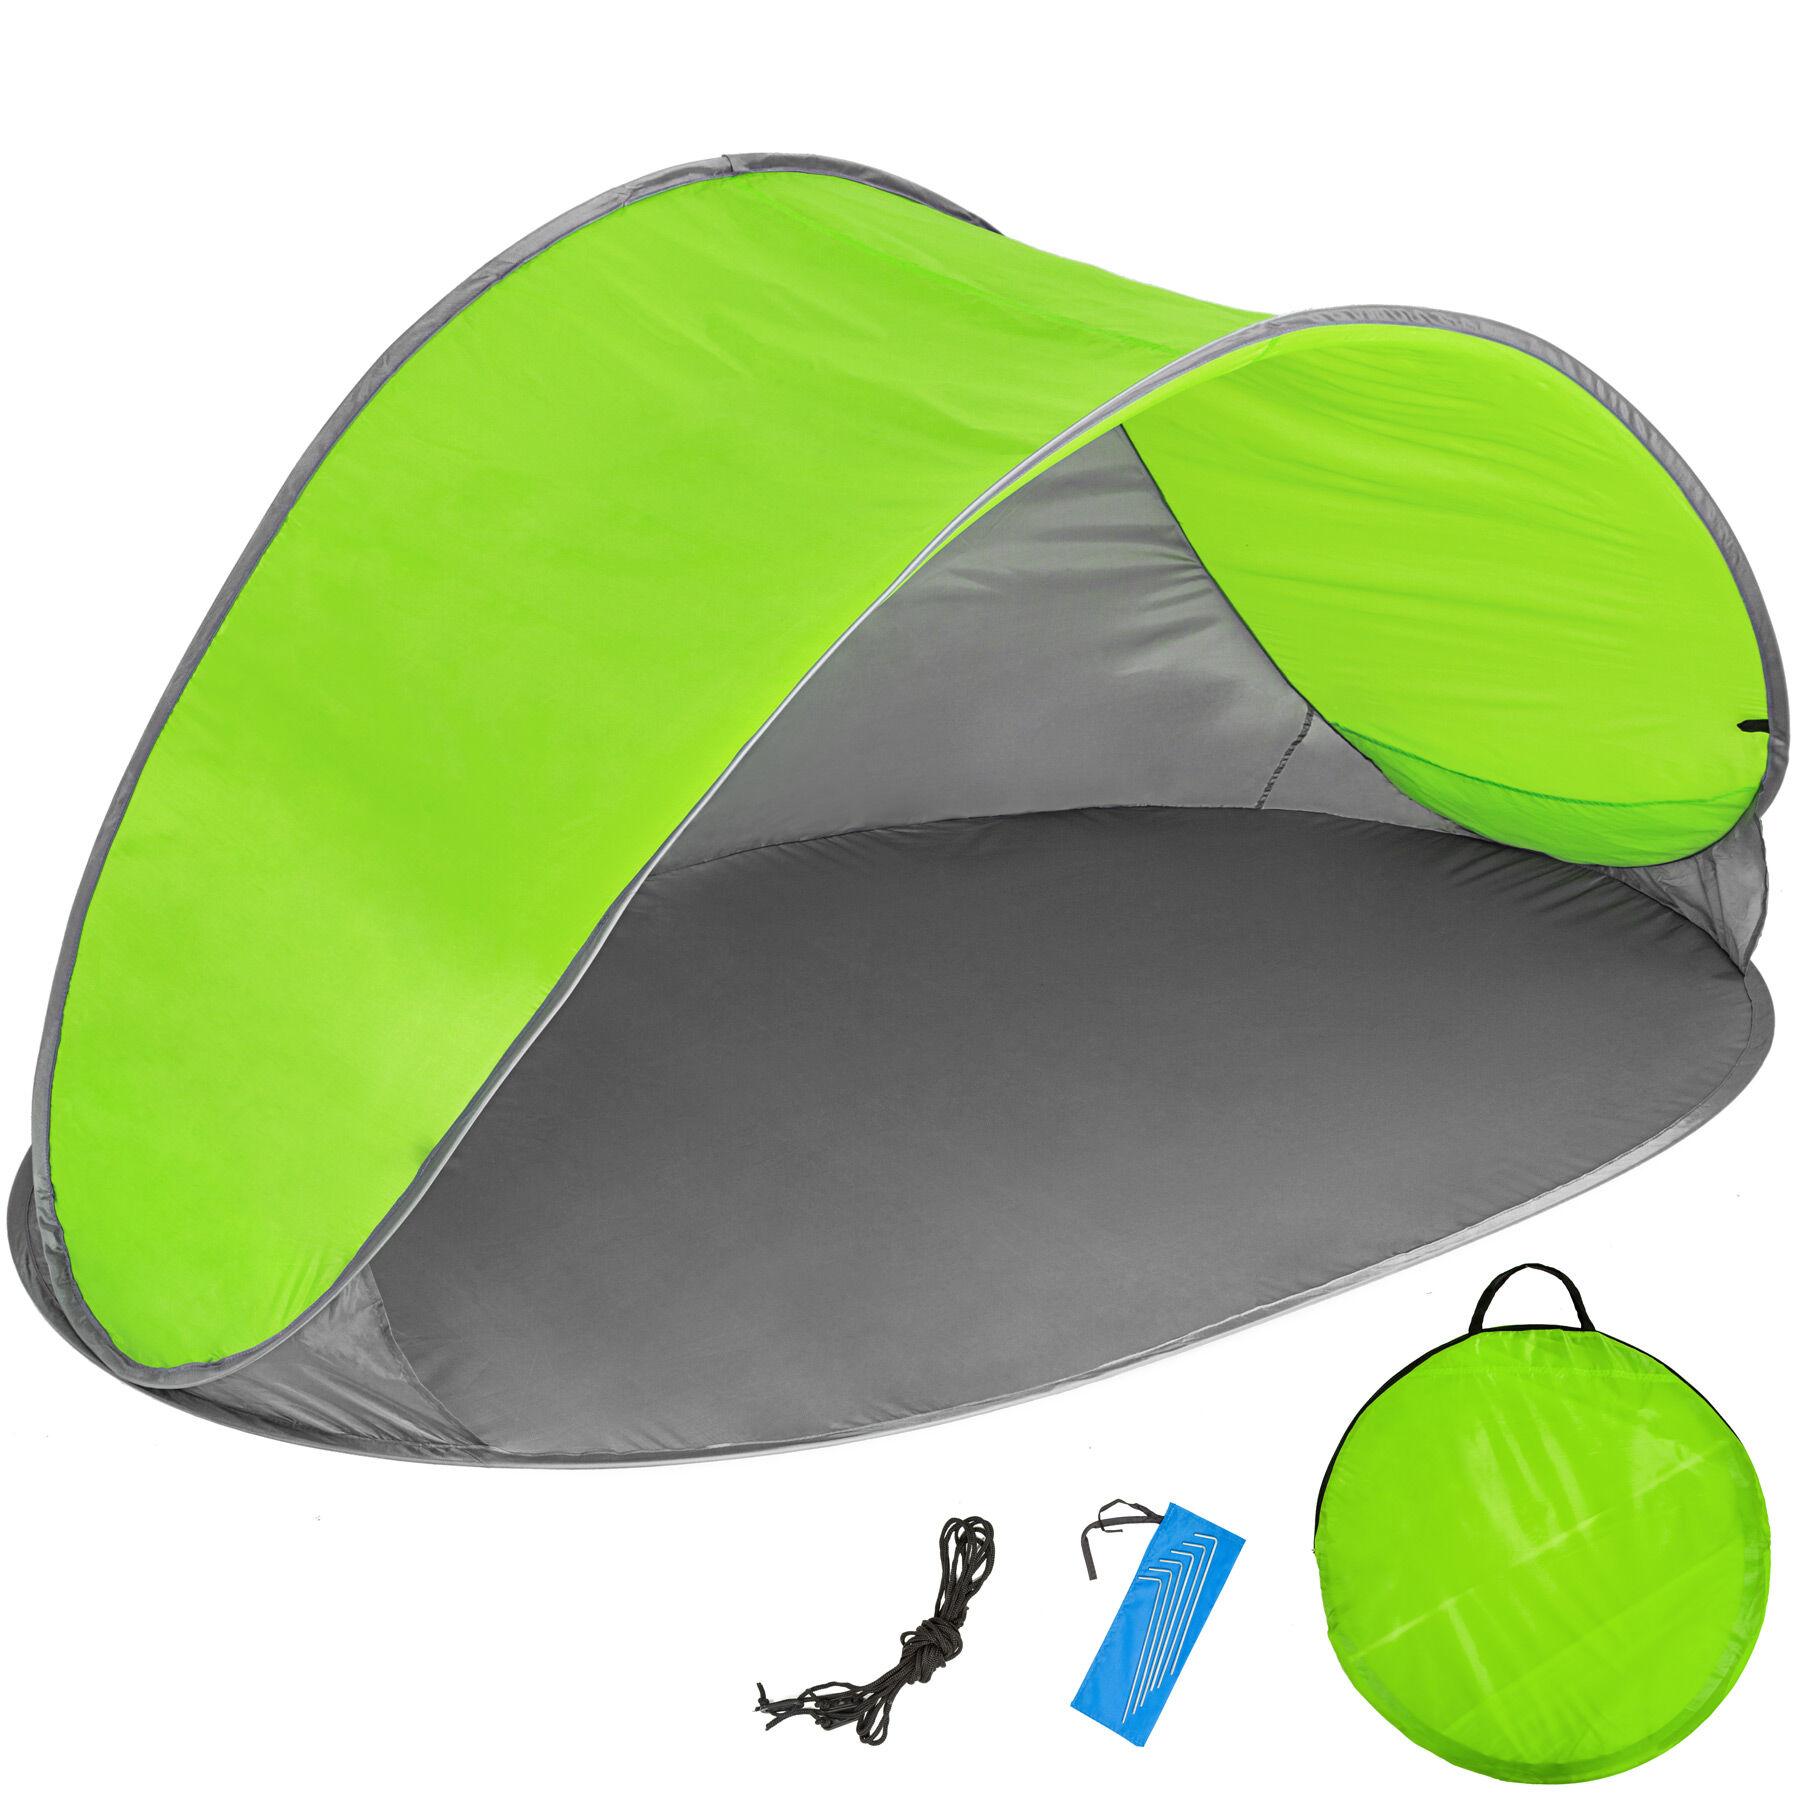 tectake tenda parasole da spiaggia ad apertura rapida jasmin - grigio/verde